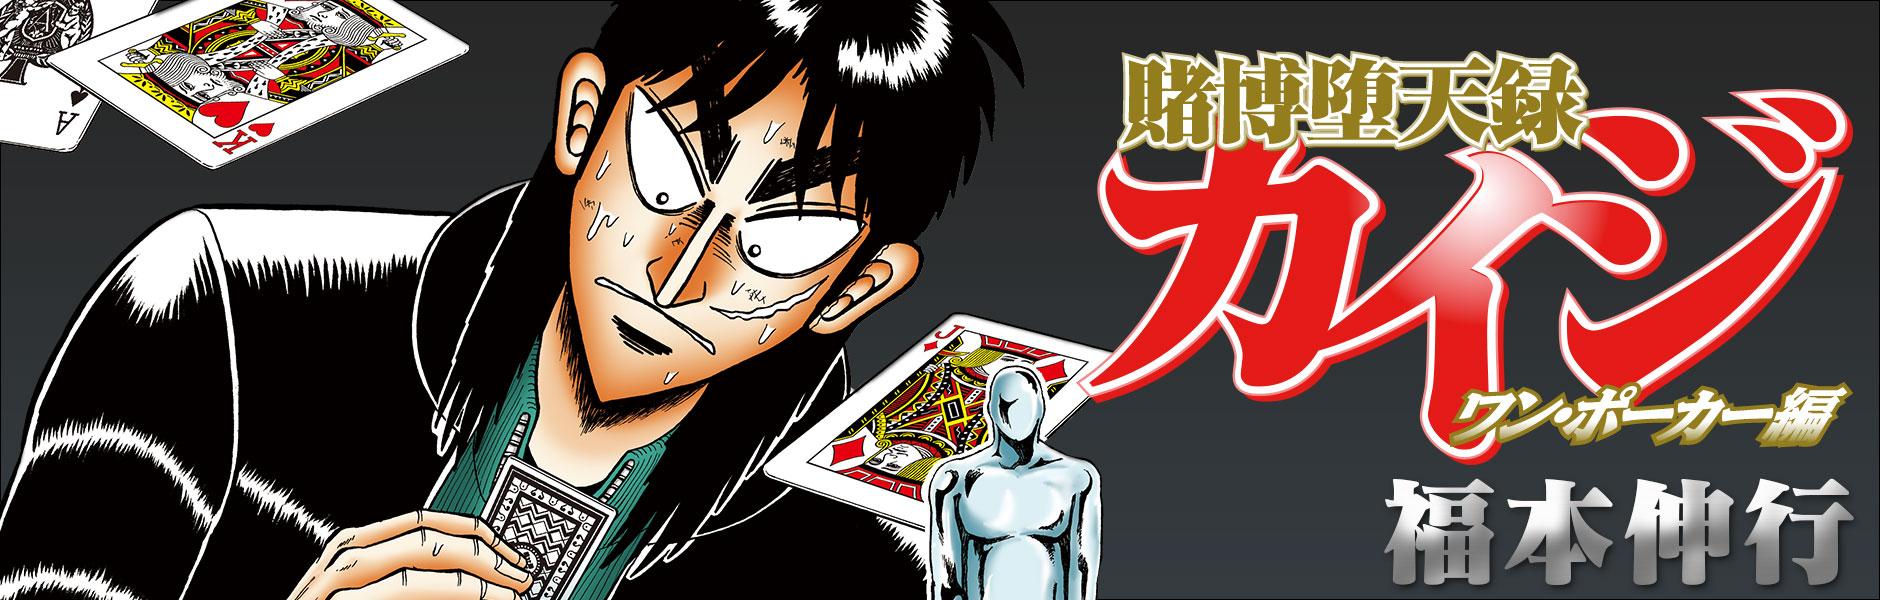 http://yanmaga.jp/content/images/tobakudatenrokukaiji_onepokerhen/main.jpg